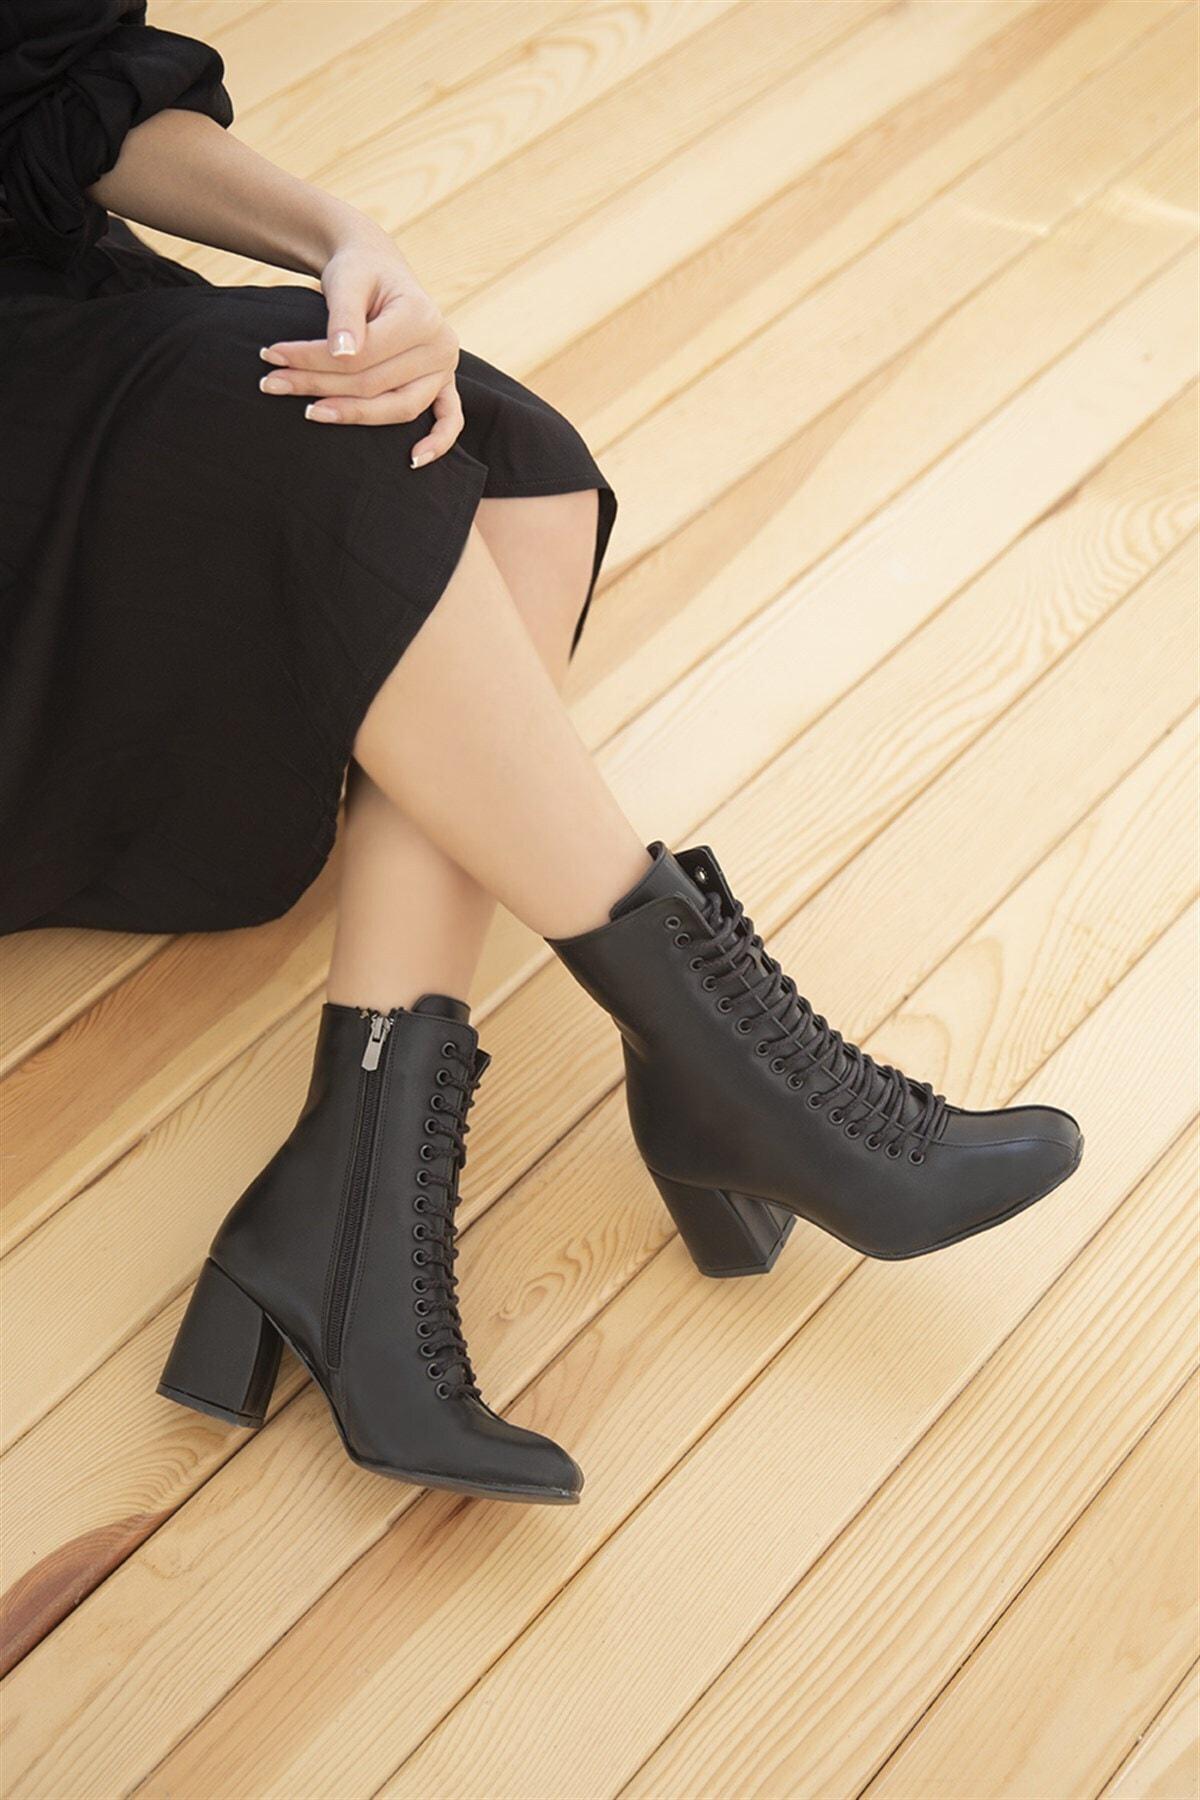 STRASWANS Kimona Bayan Topuklu Deri Bağcıklı Bot Siyah 2